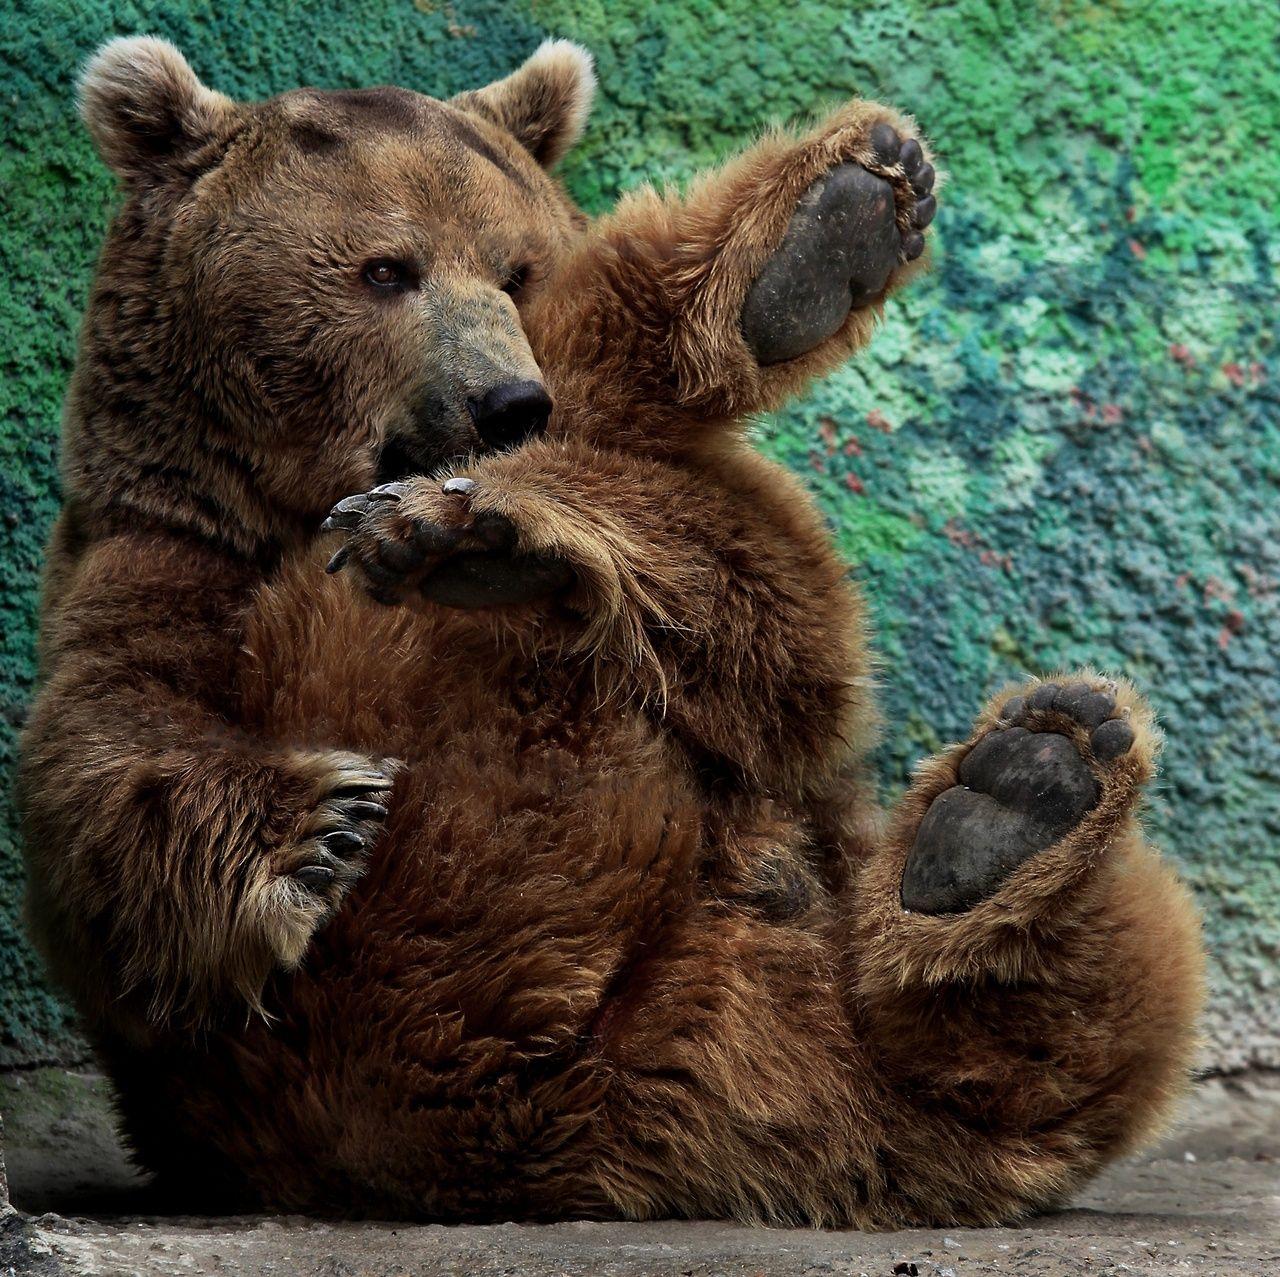 Tumblr Nd4cyj9ux71rcvh74o1 1280 Jpg Izobrazhenie Jpeg 1280 1277 Pikselov Masshtabirovannoe 51 Bear Cubs Bear Bear Wallpaper